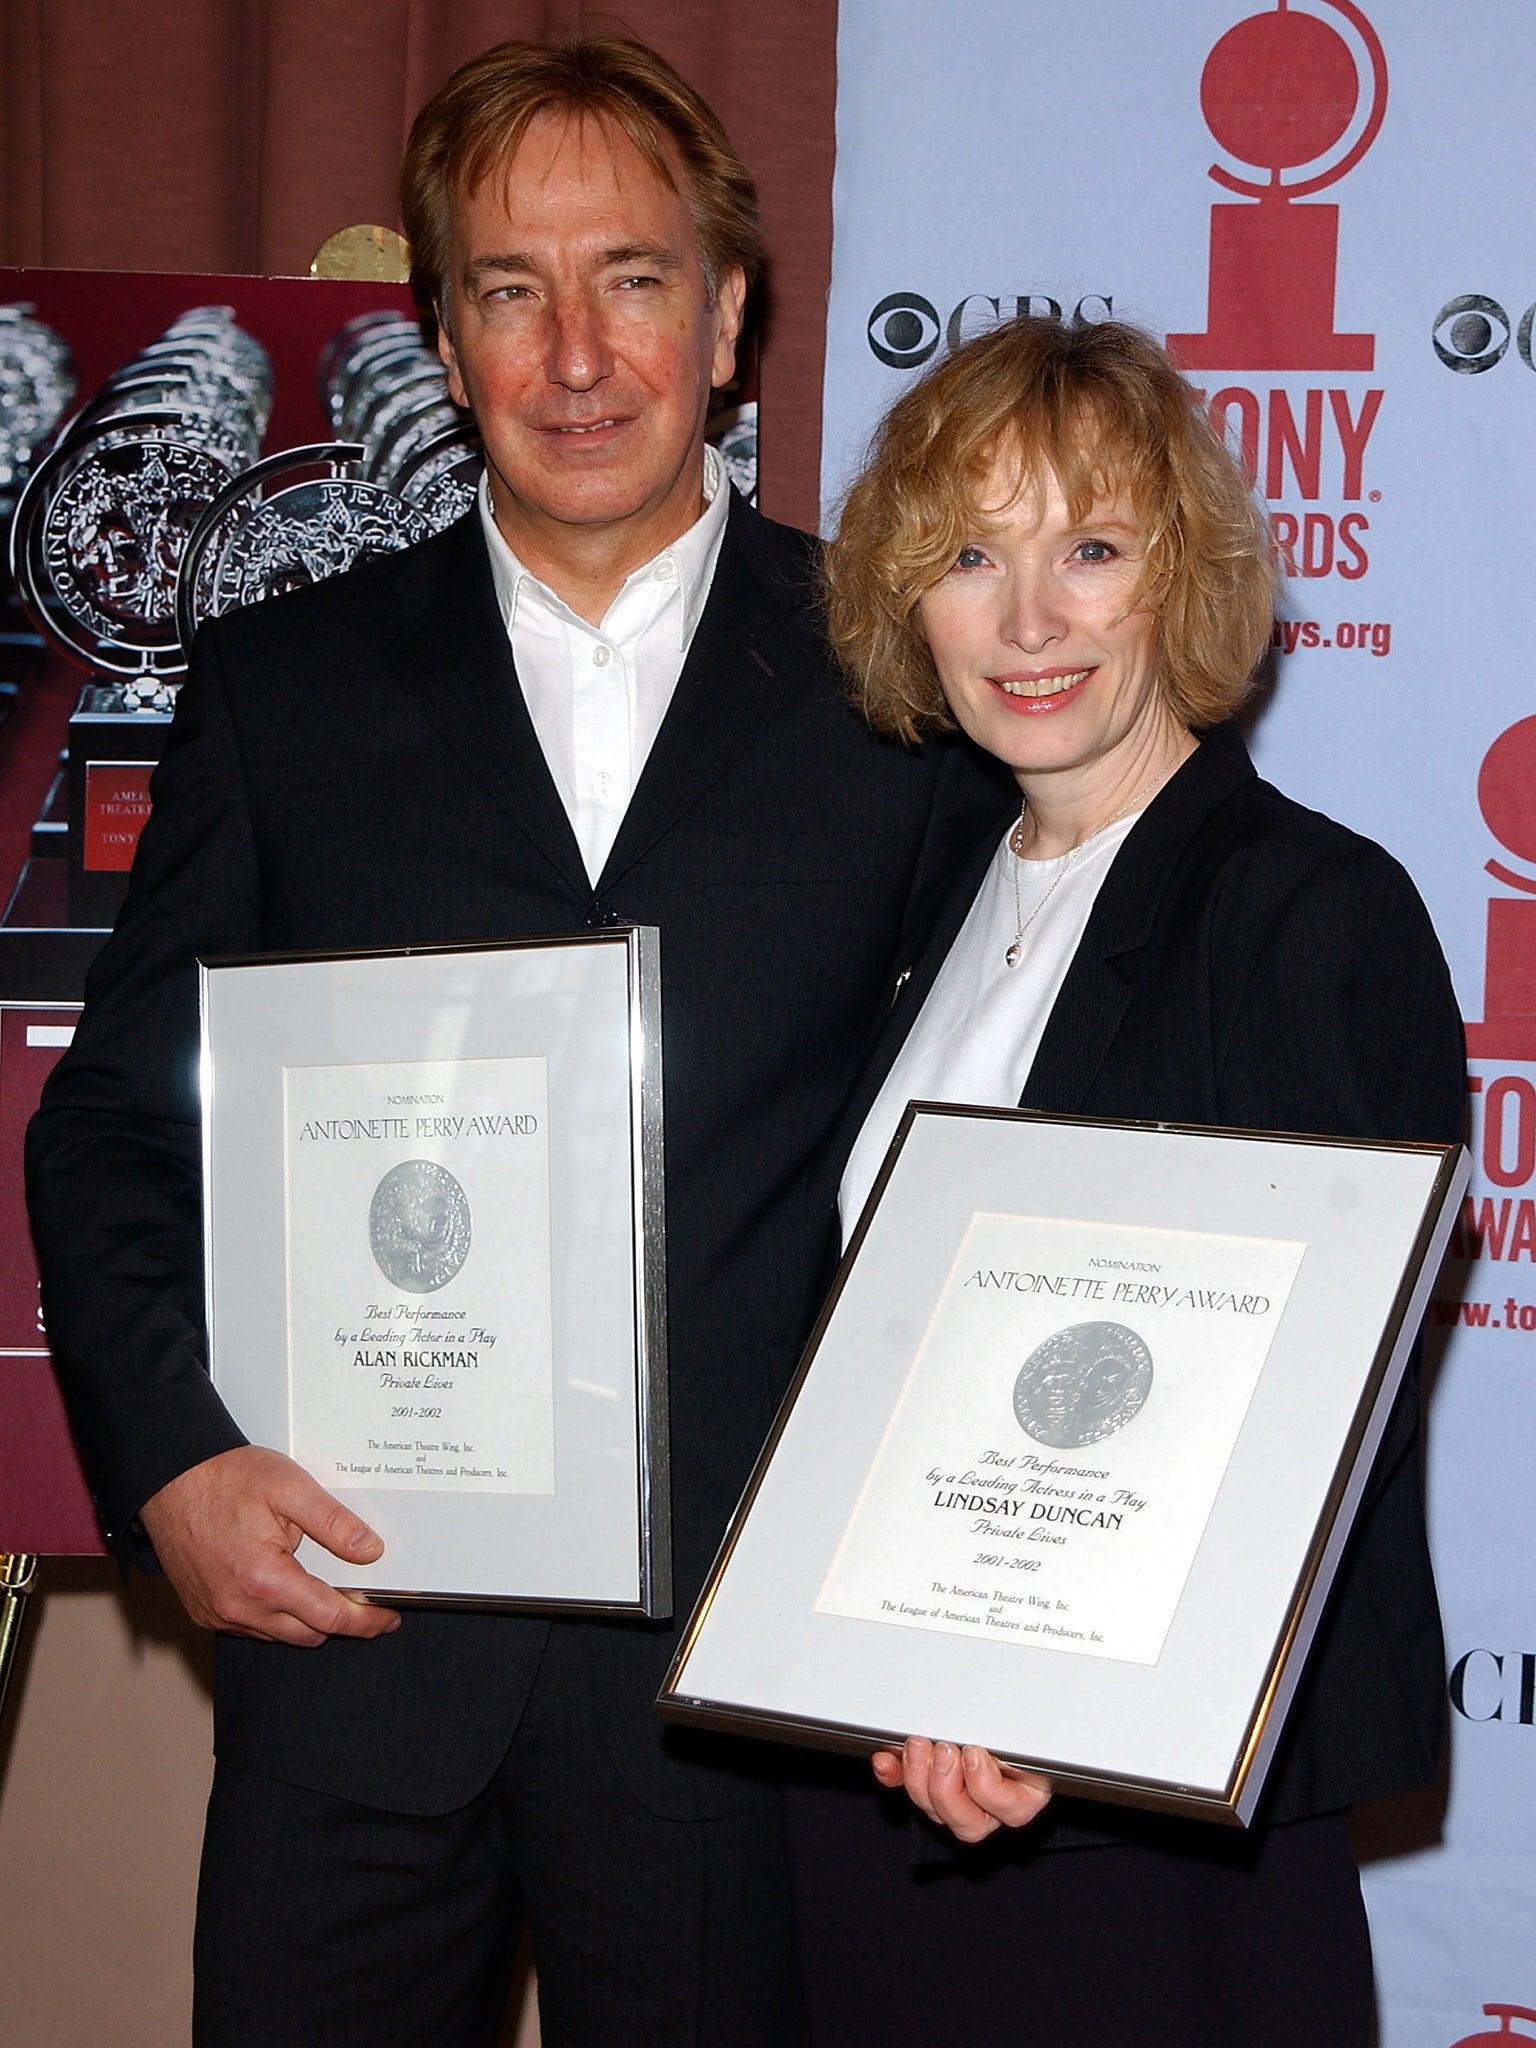 Alan Rickman dead: British actor and theatre legend has died